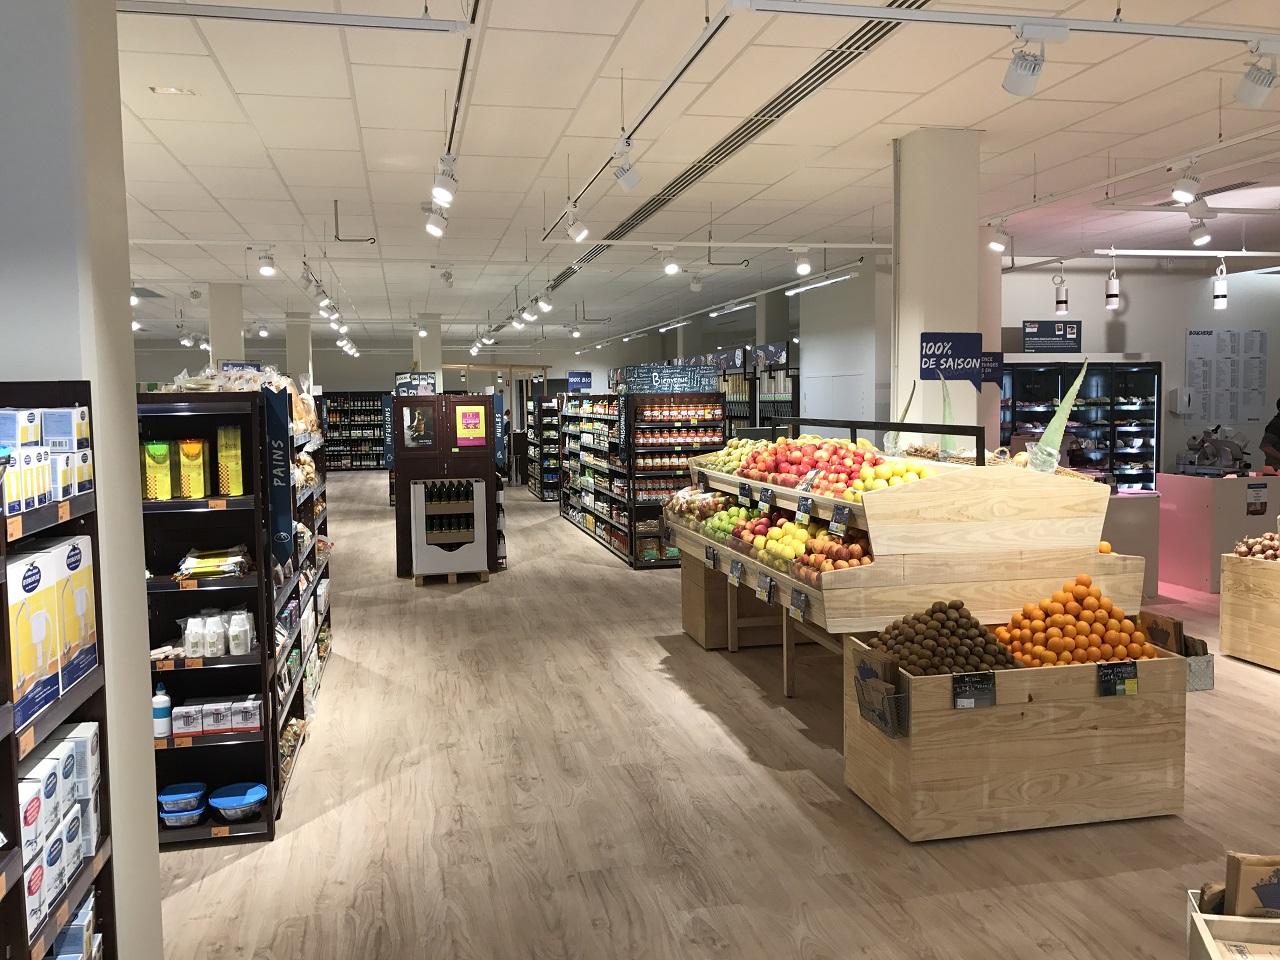 fenouil biocoop magasin bio le mans visite guidee atlantides janvier 2019